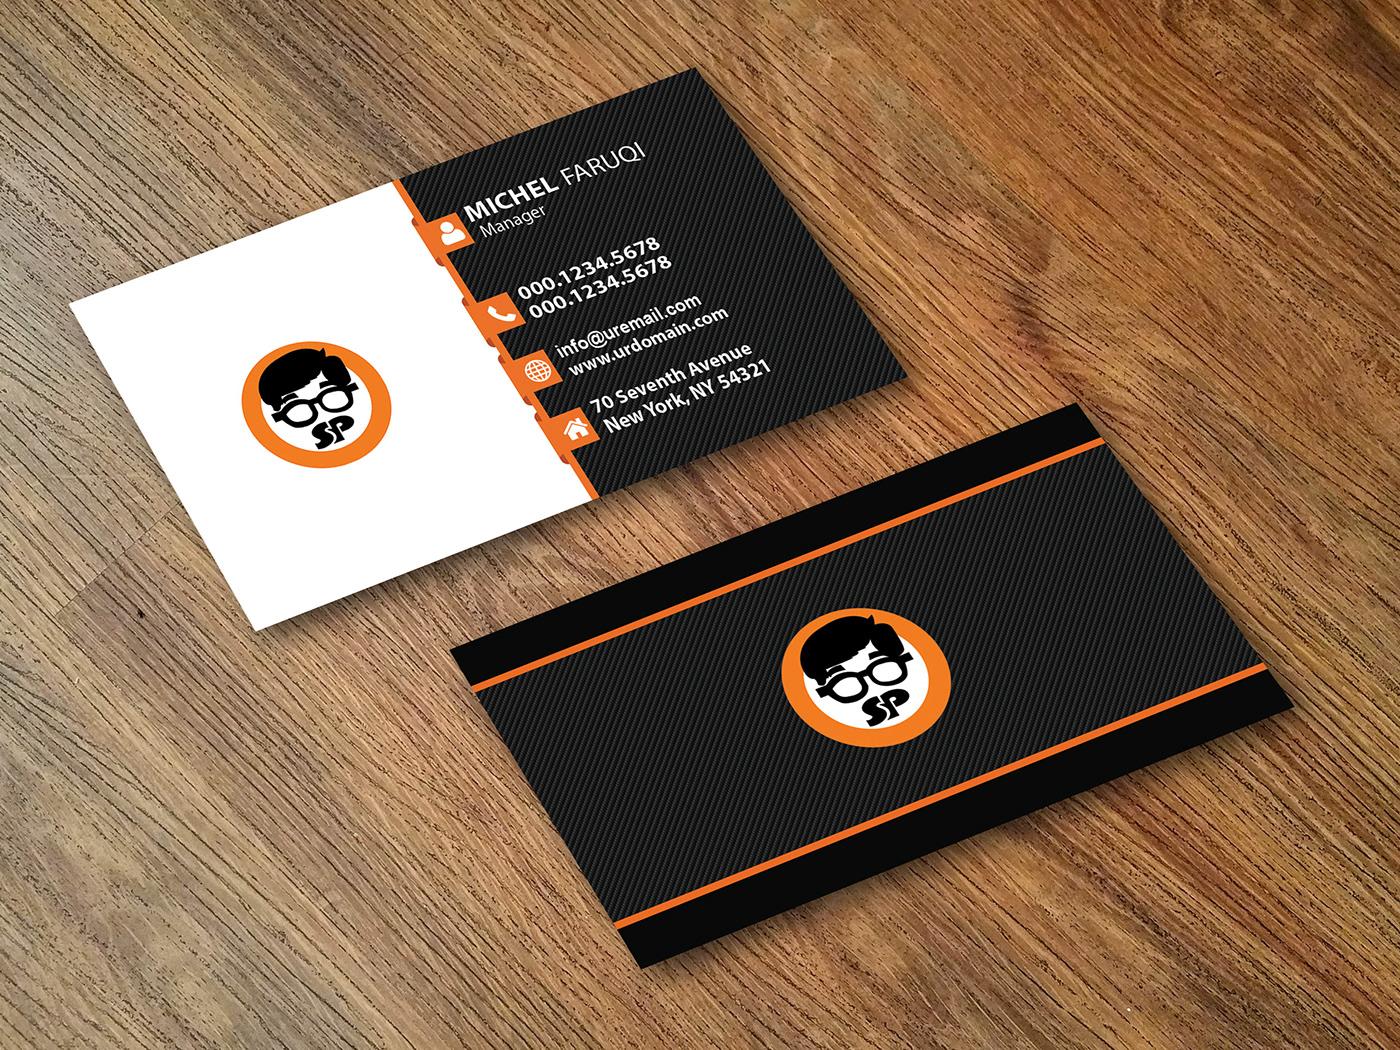 5 Free Business Card Mockup Templates For Designers Hyperviolet